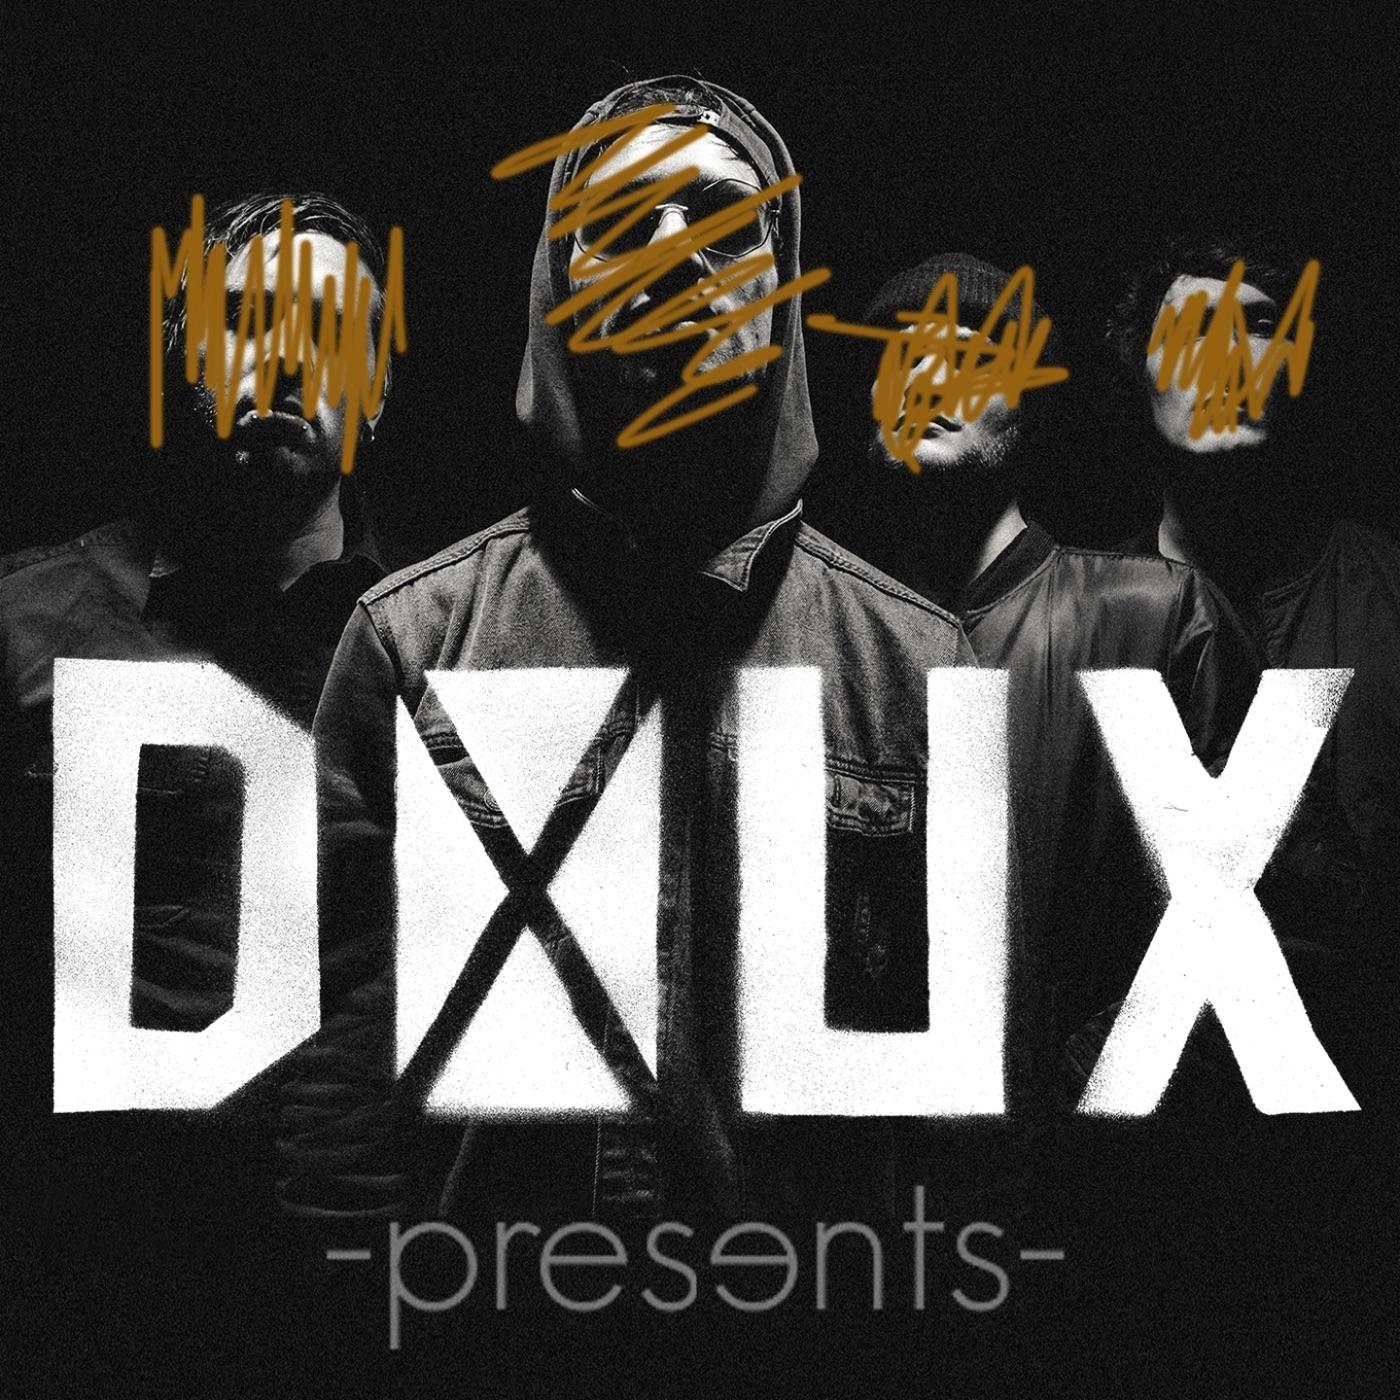 Doux - Presents (2019)